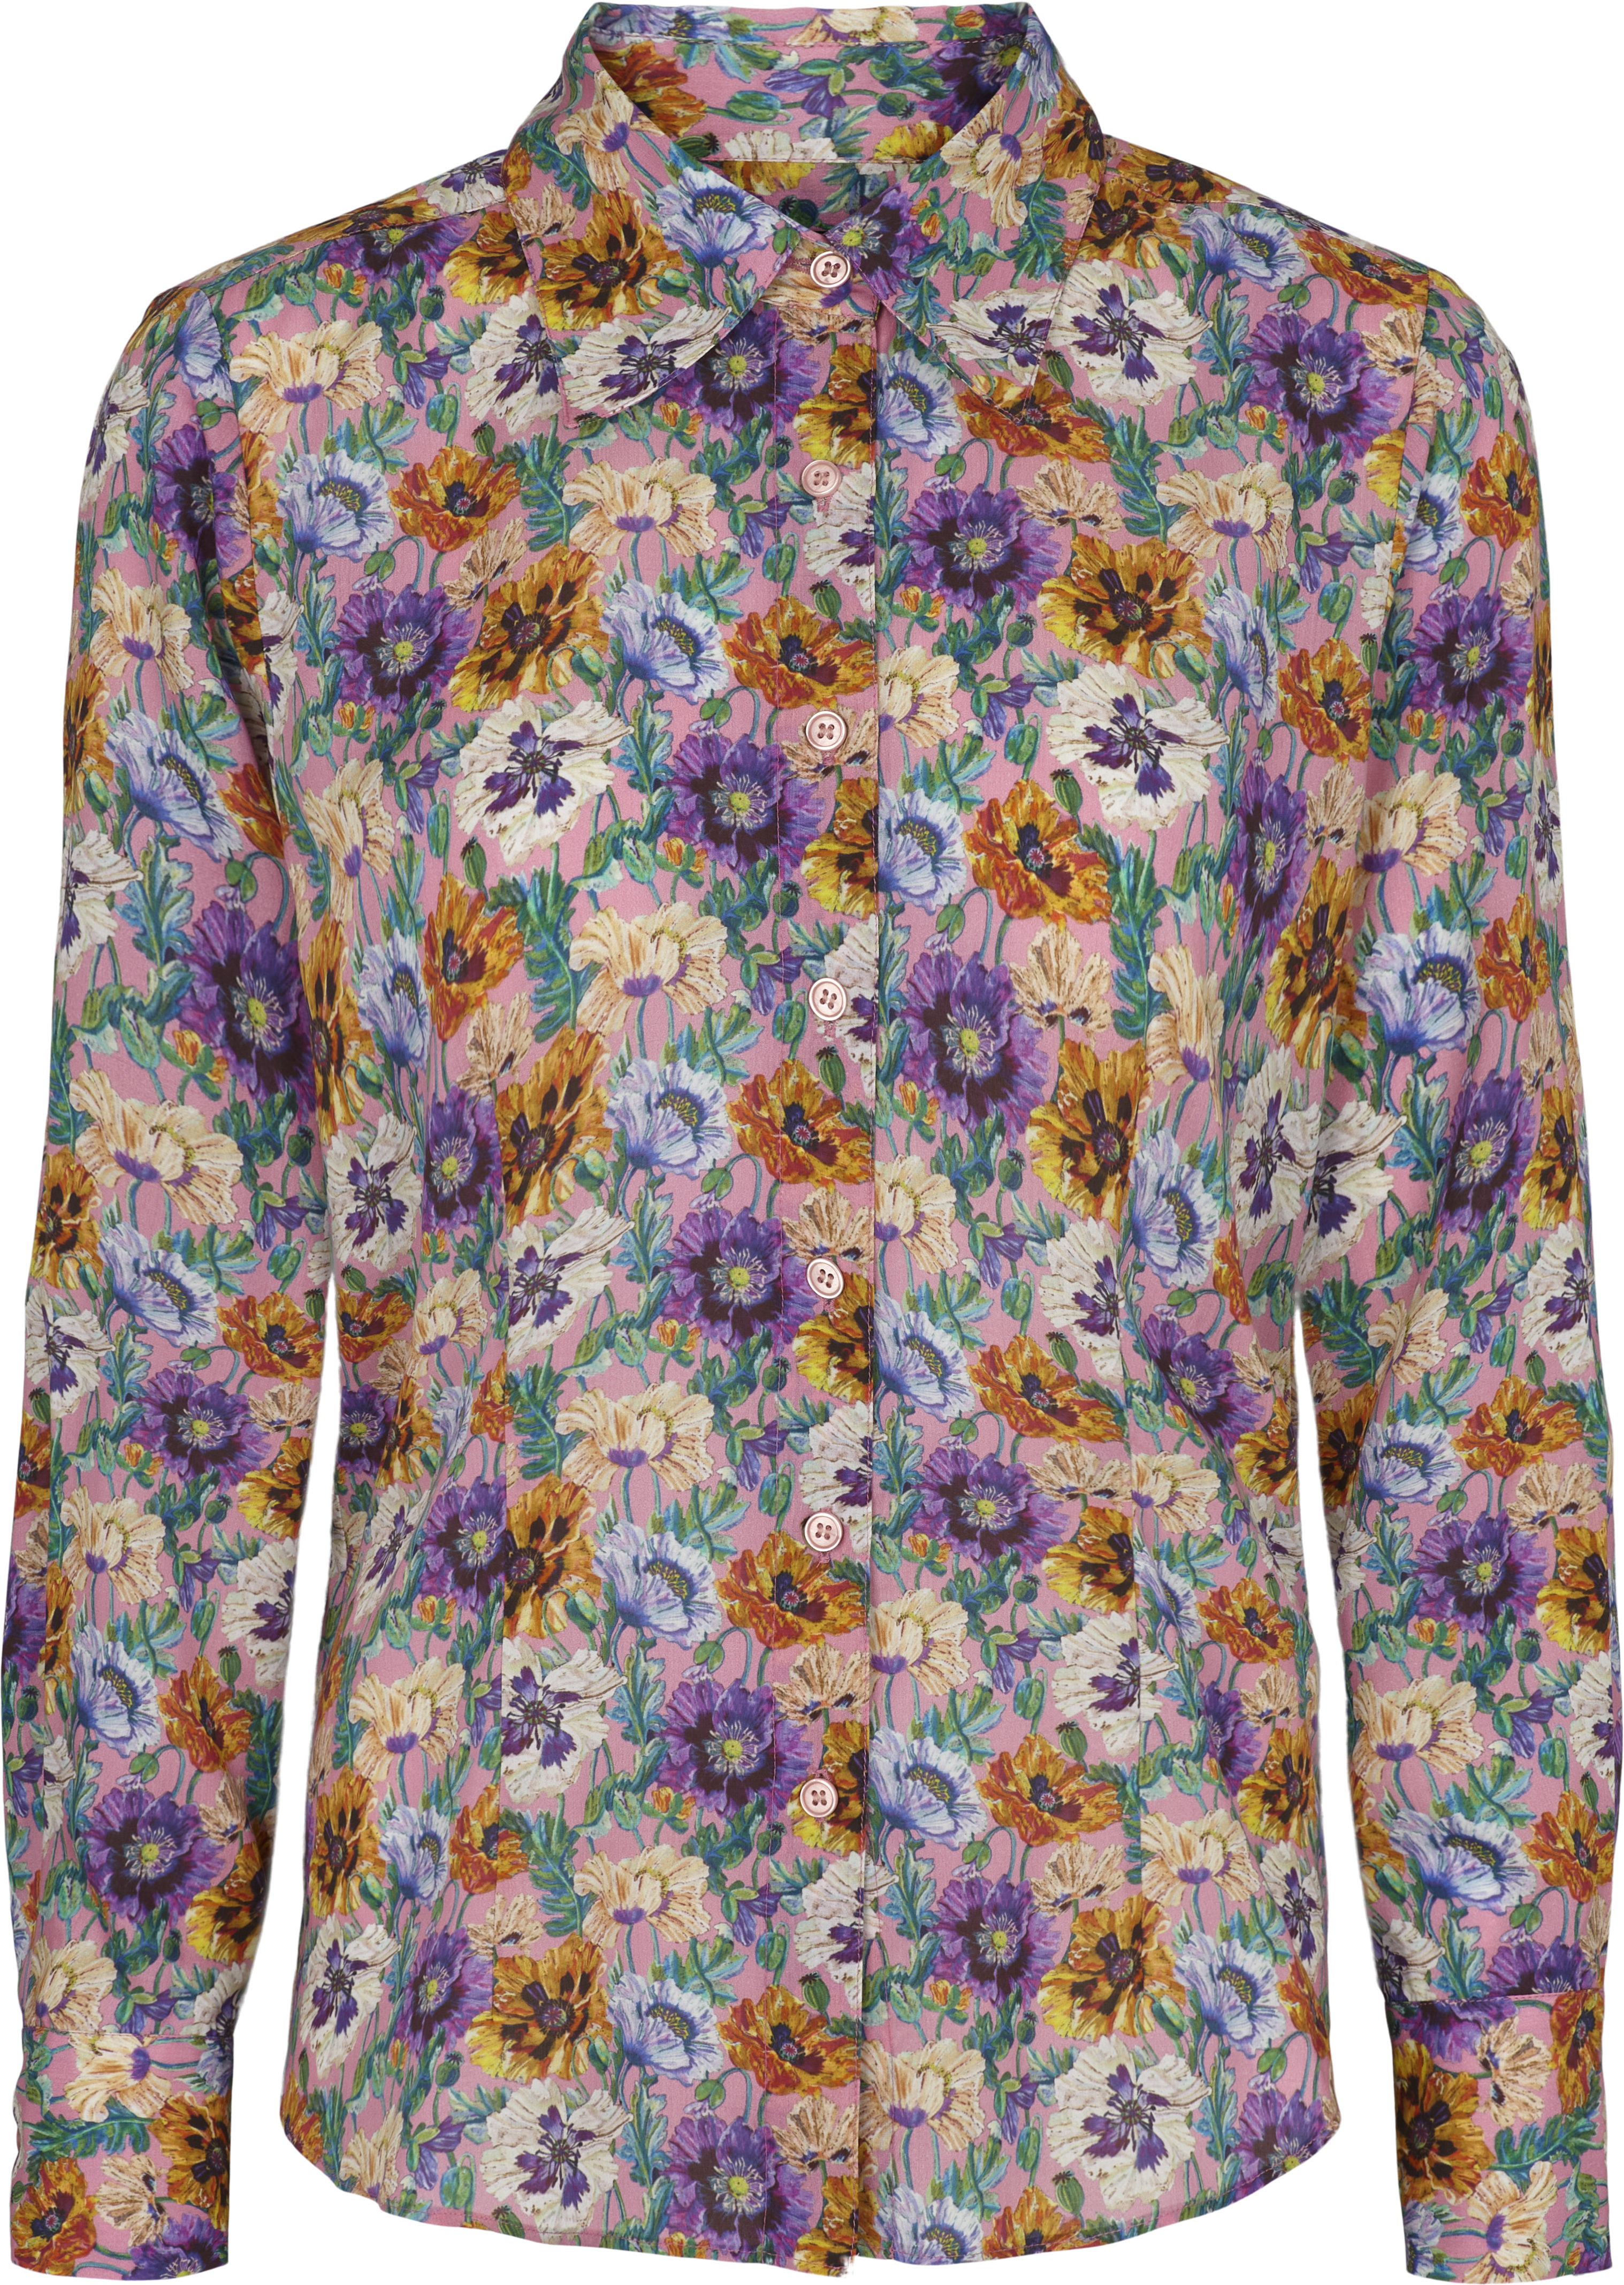 SAND Lotte skjorte